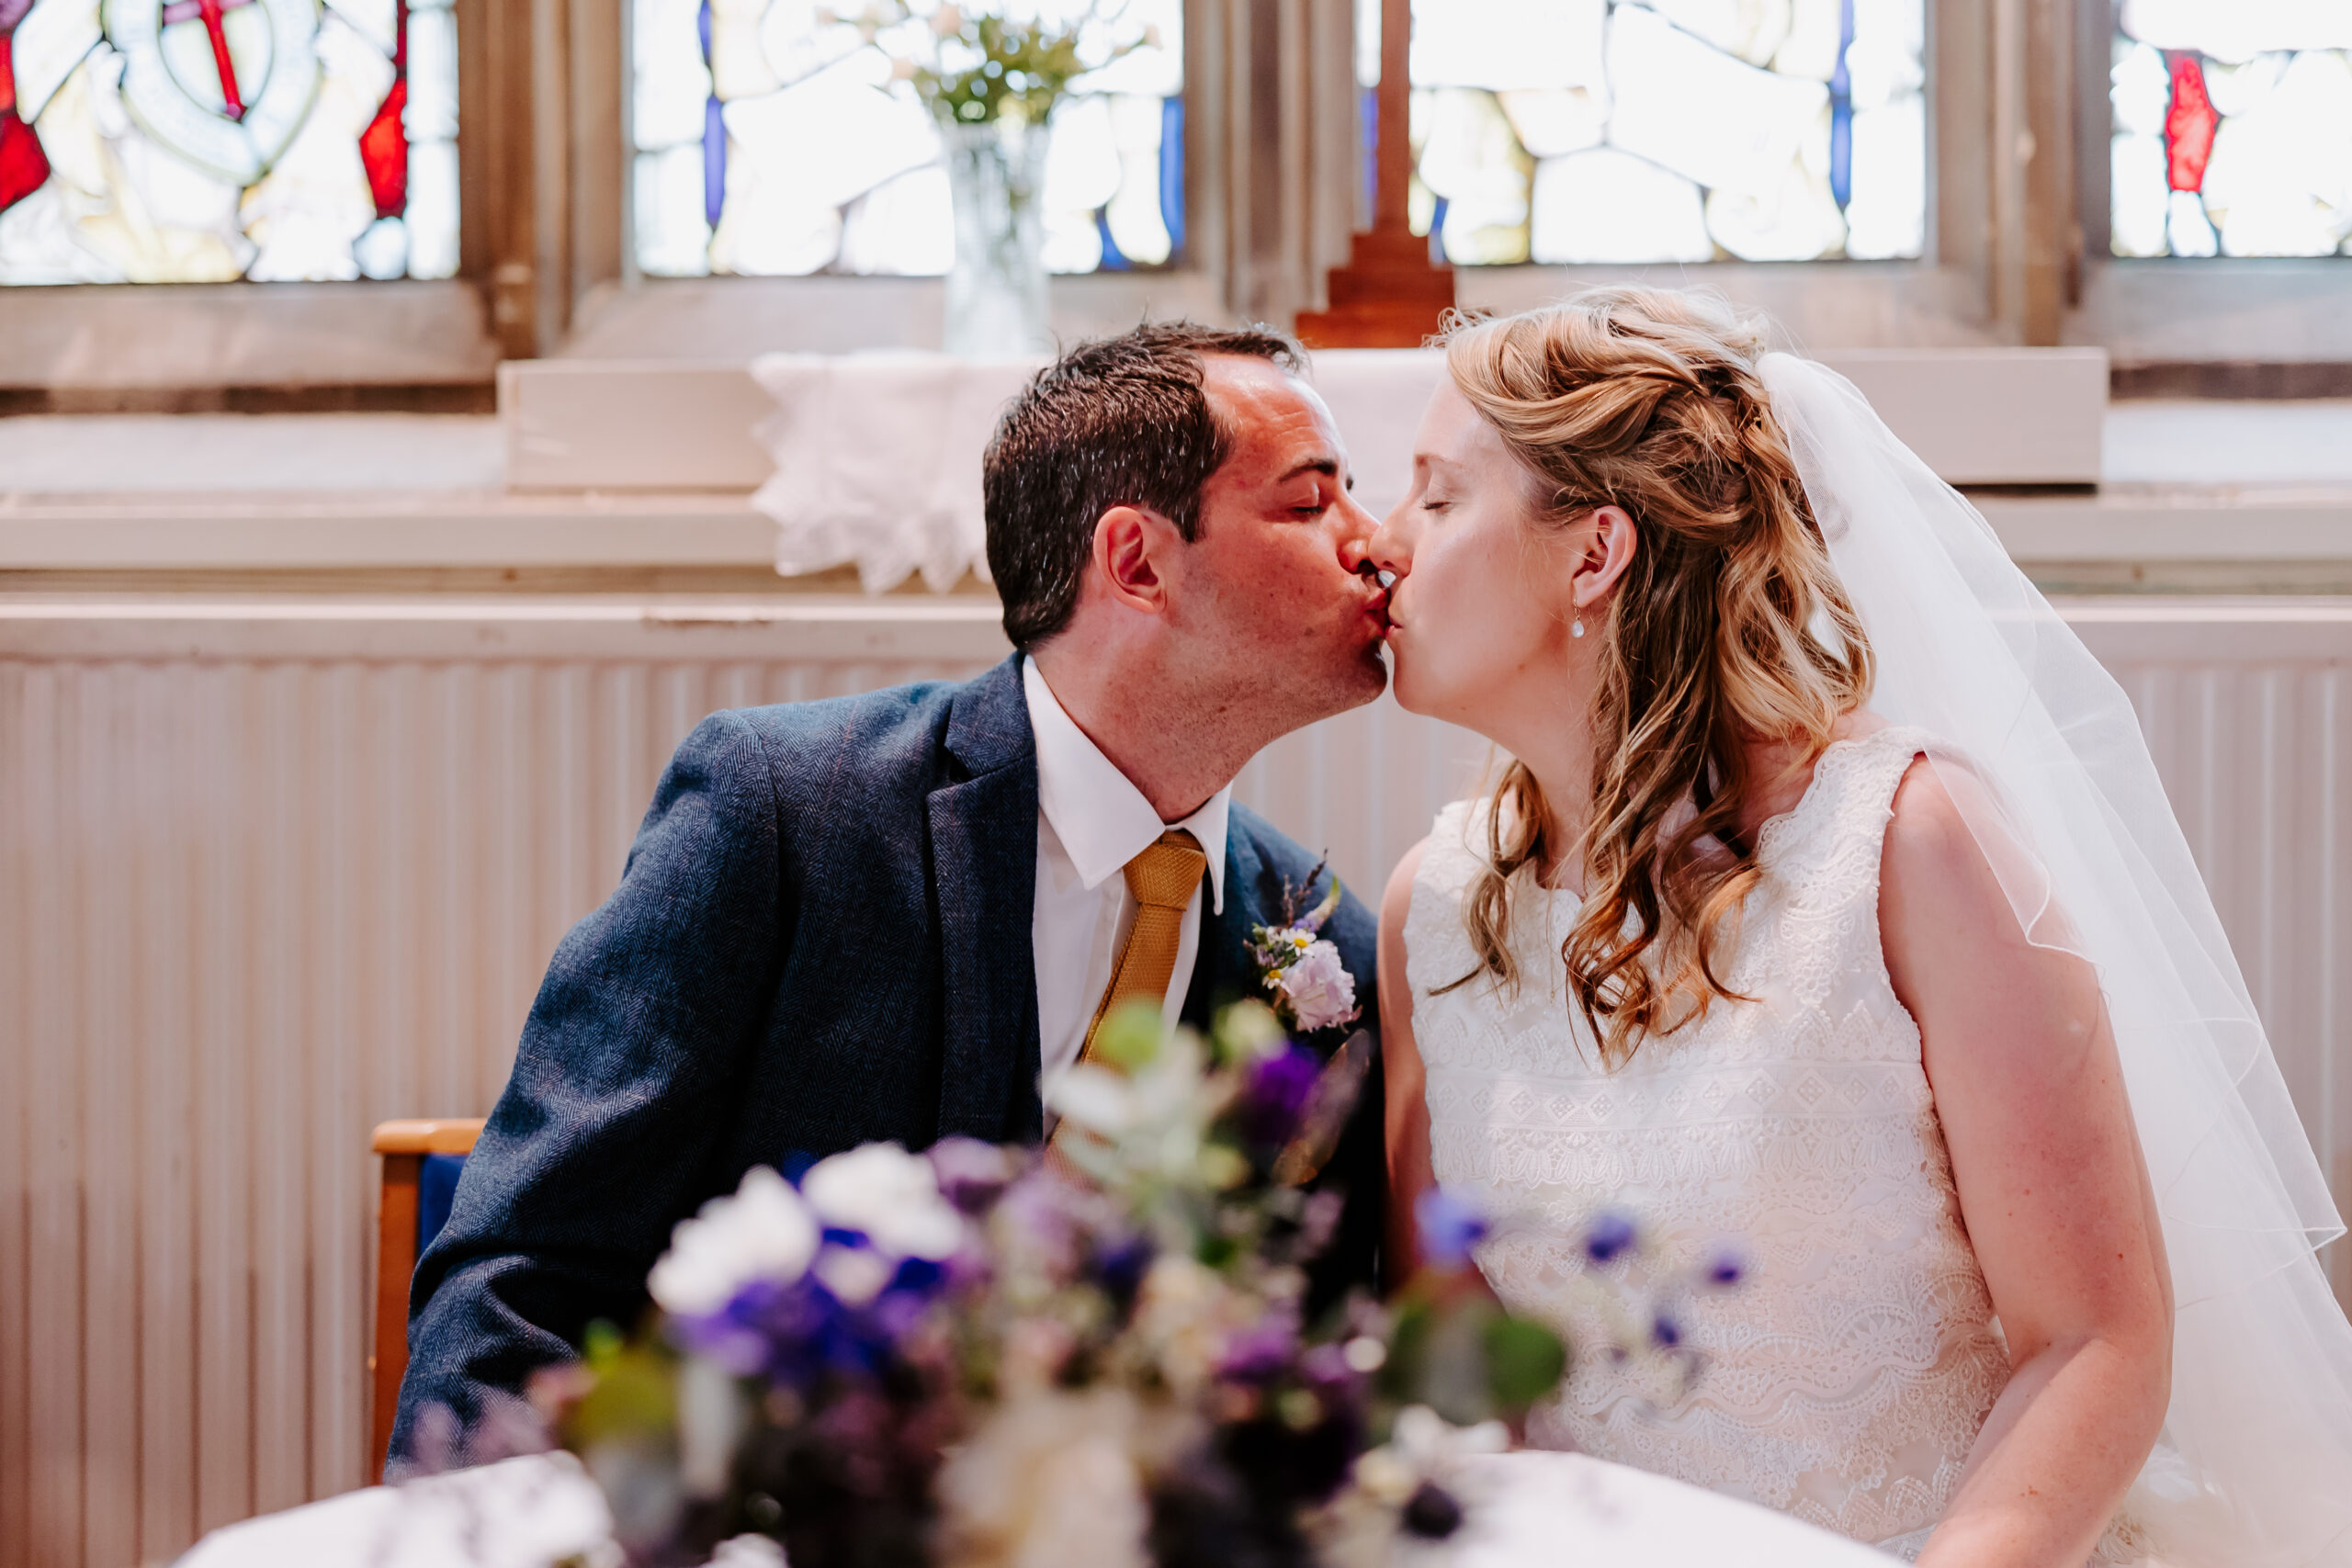 Devon wedding day kiss after signing the register